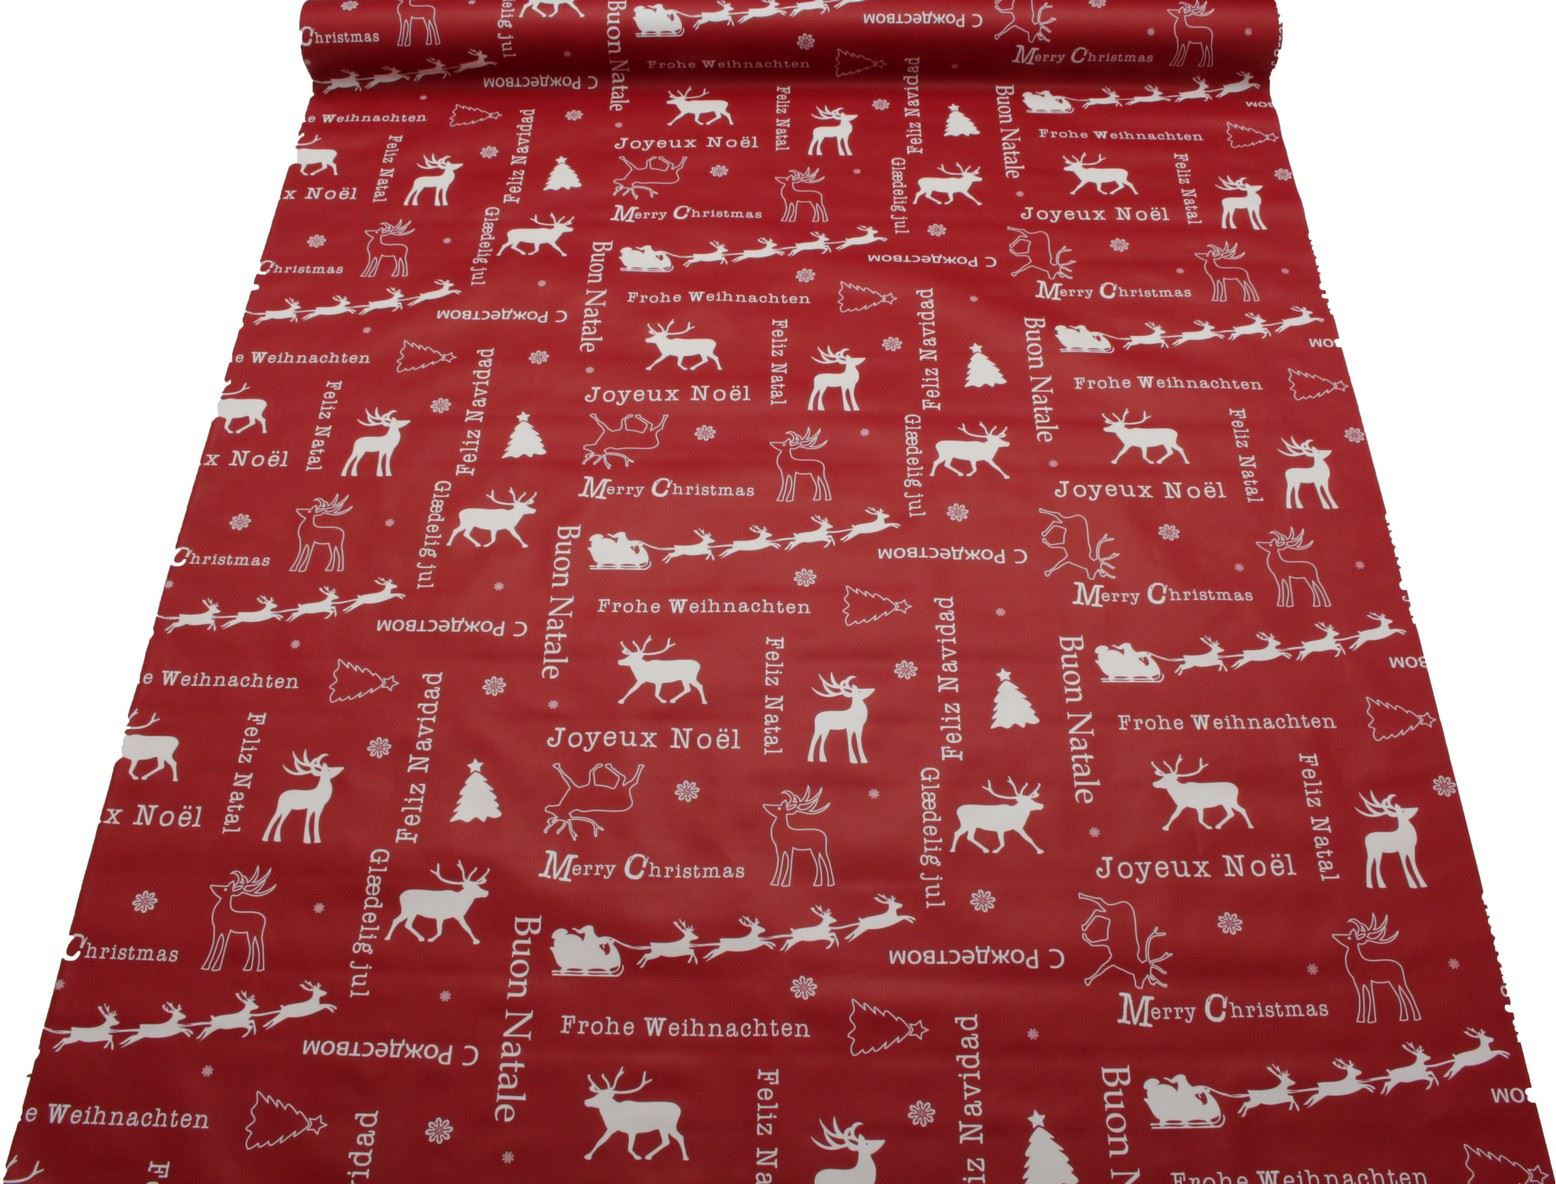 thumbnail 23 - CHRISTMAS PVC OILCLOTH VINYL FABRIC XMAS KITCHEN TABLE WIPECLEAN TABLECLOTHS